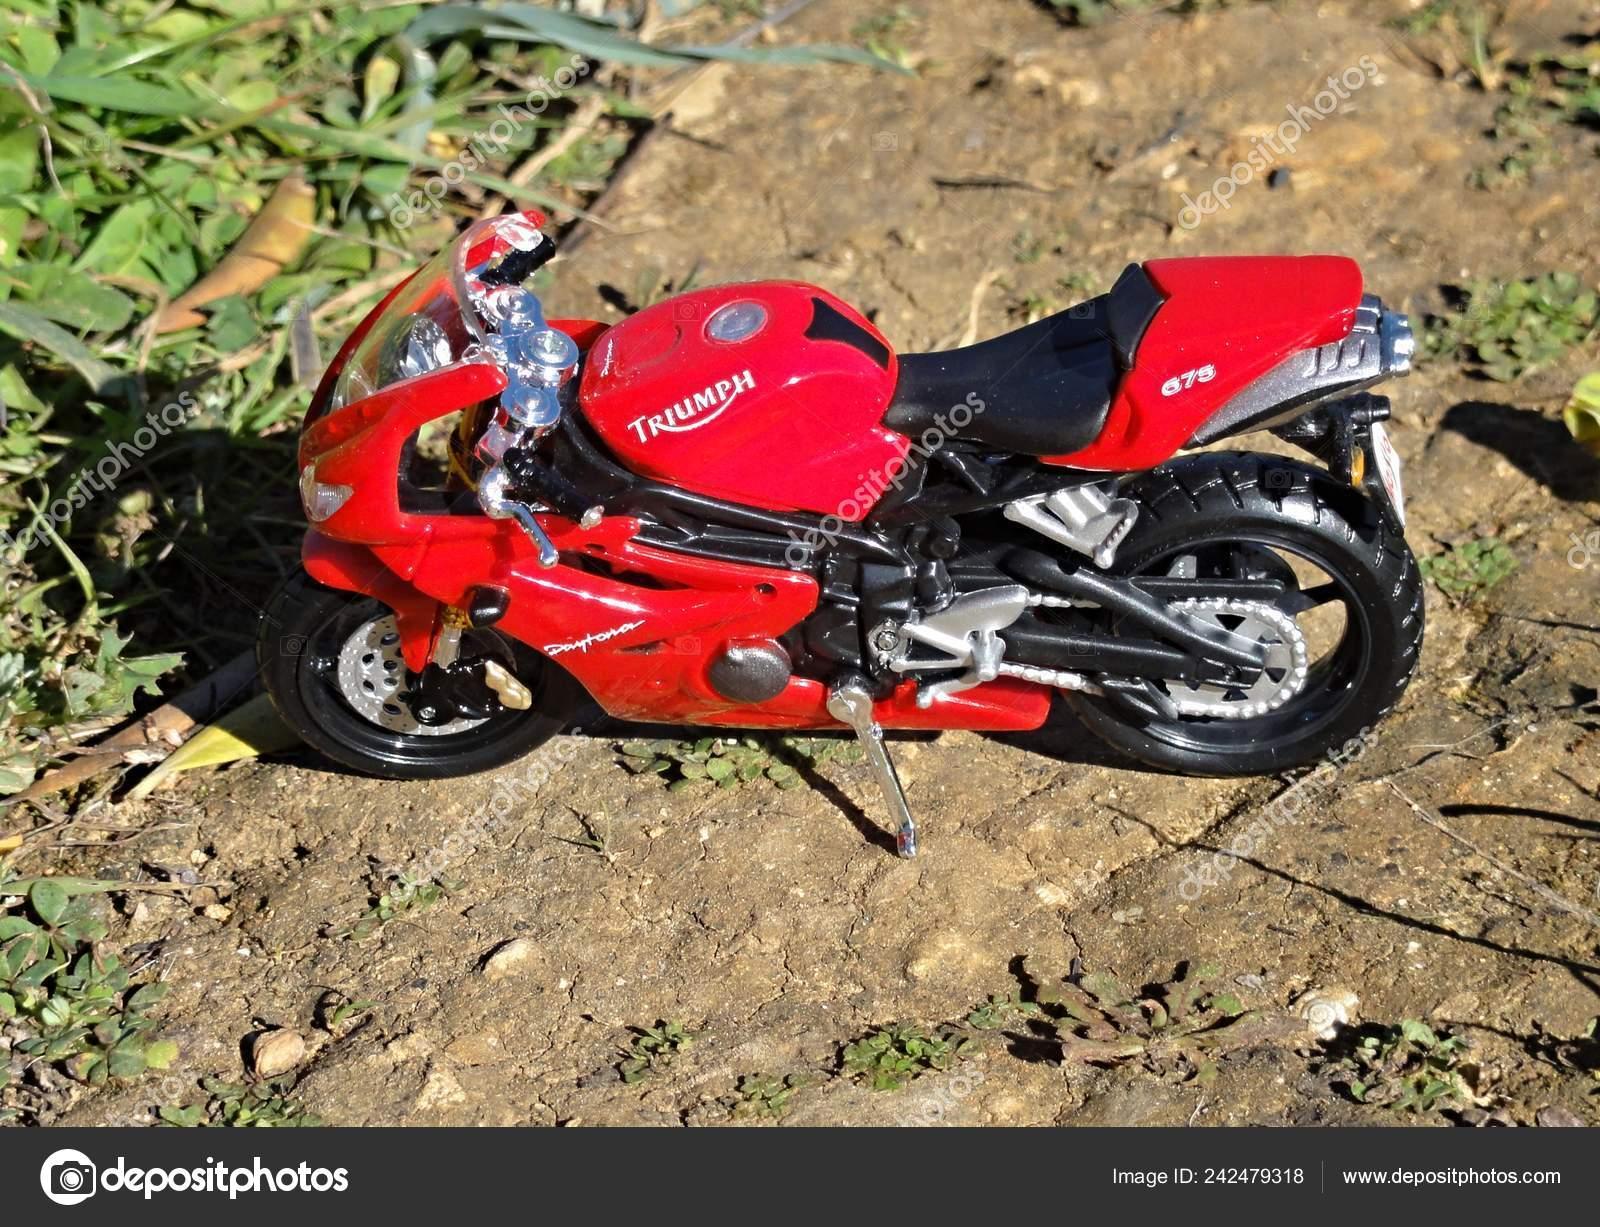 Great Triumph Daytona 675 Model Motorbike Nature Stock Editorial